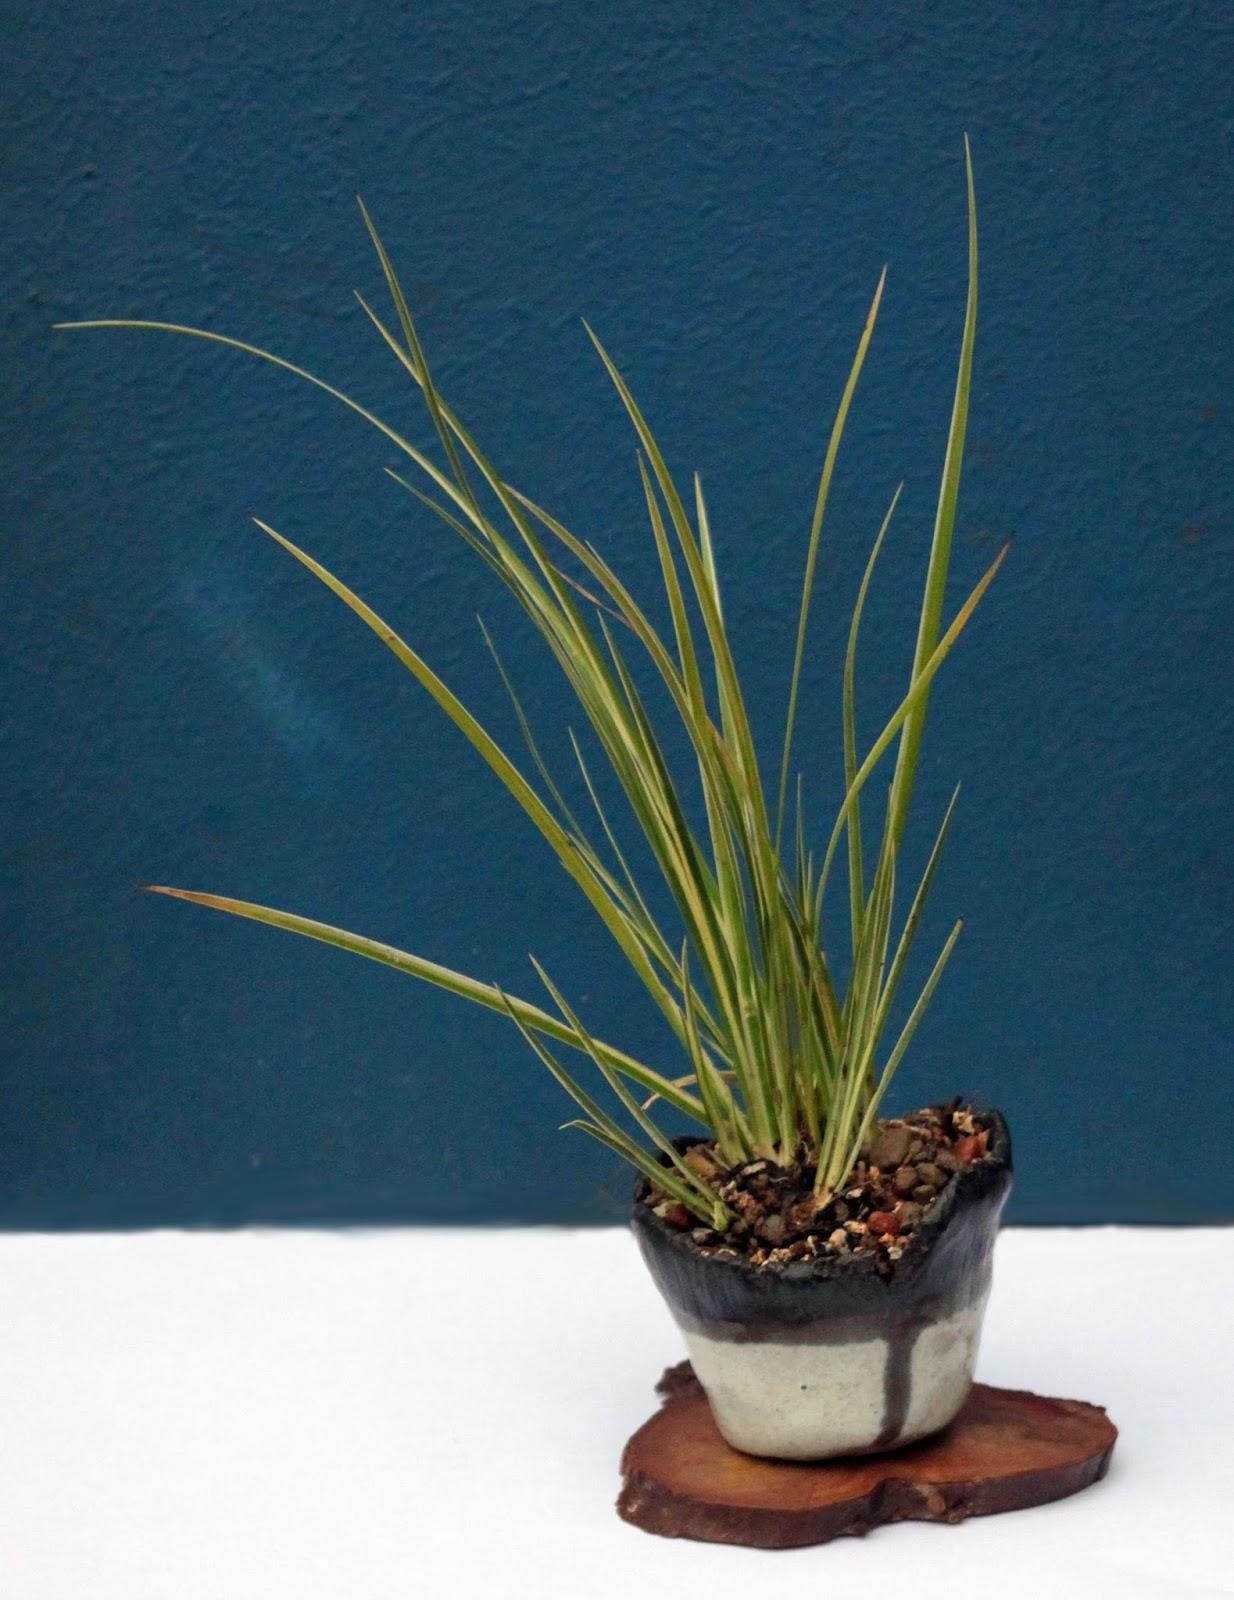 Yamadori art uk ostranica bonsai pots for Unusual bonsai creations